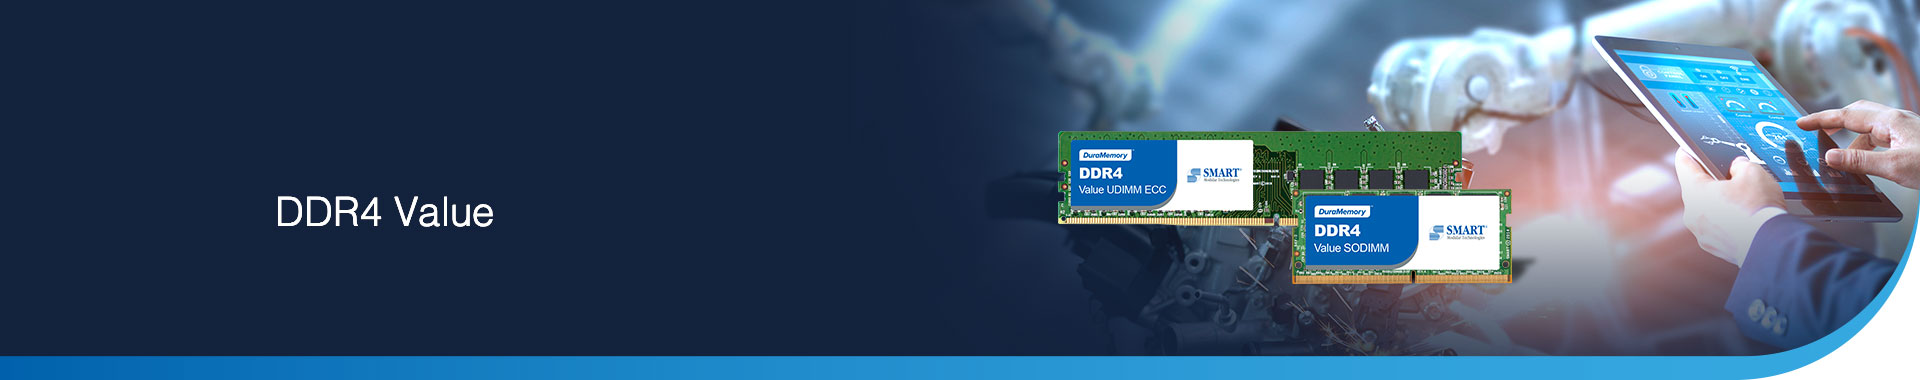 SMART_DuraMemory_DDR4_Value